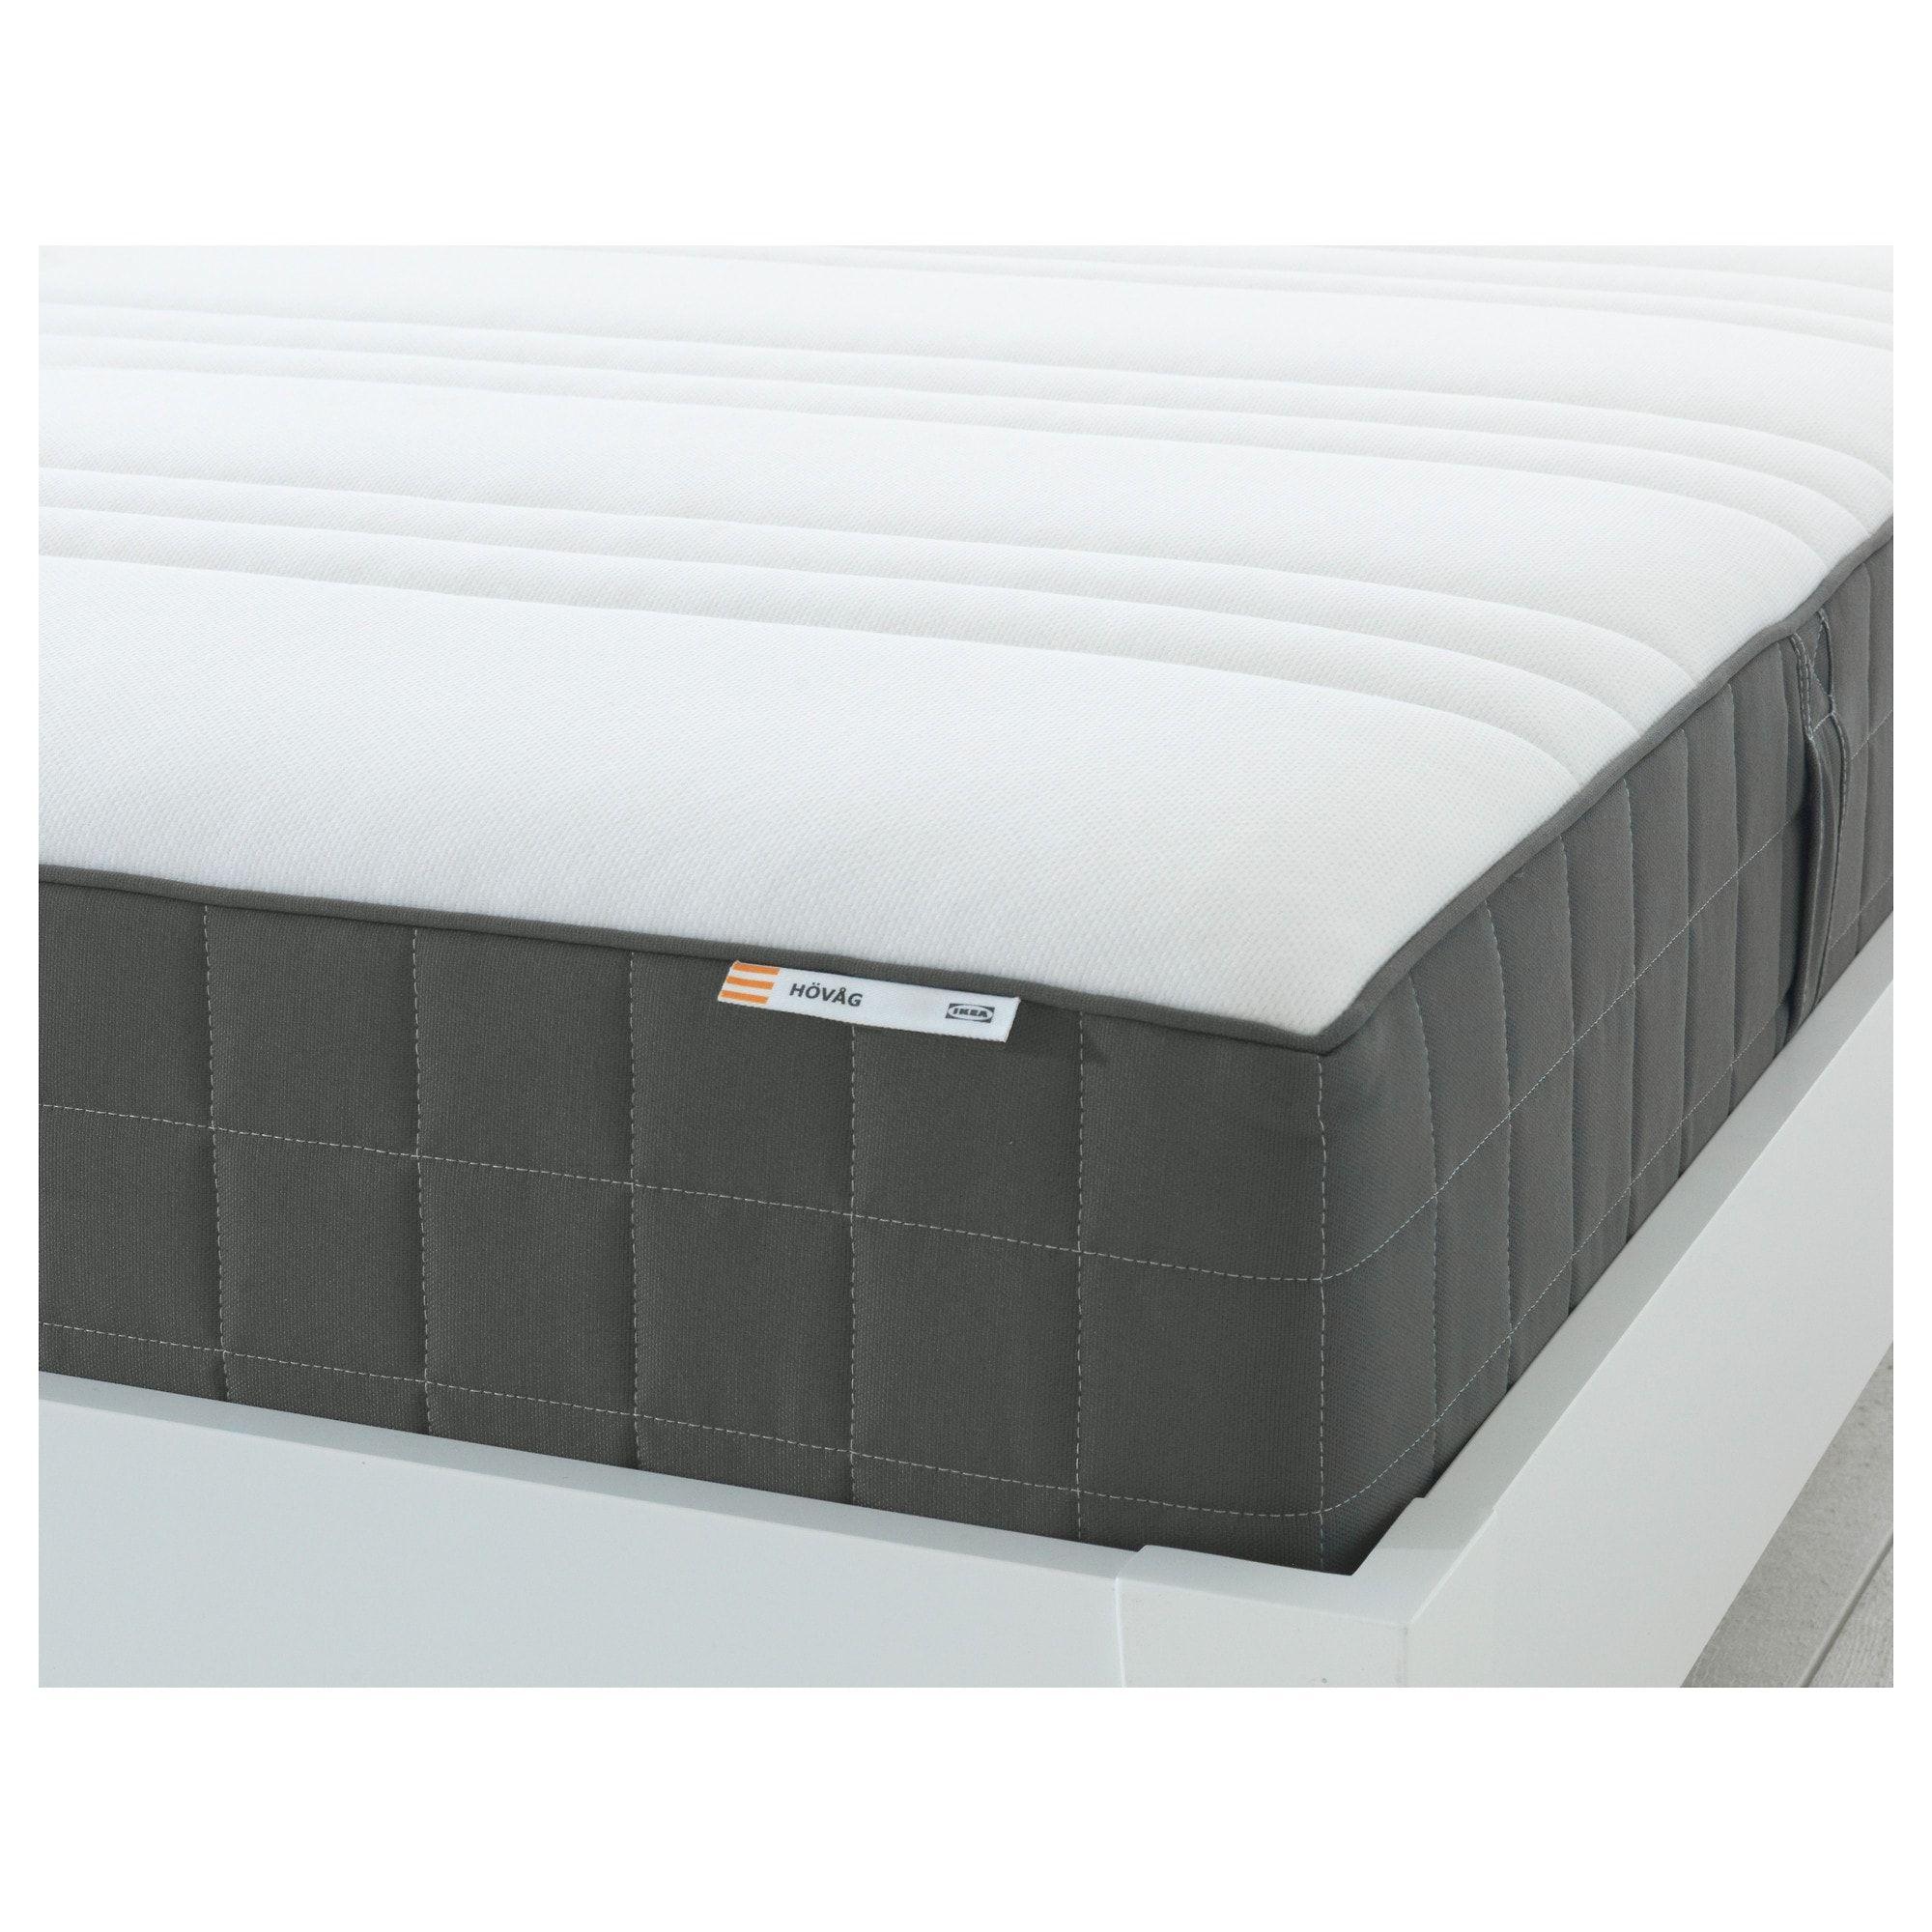 HÖVÅG Pocket sprung mattress firm, dark grey 120x190 cm